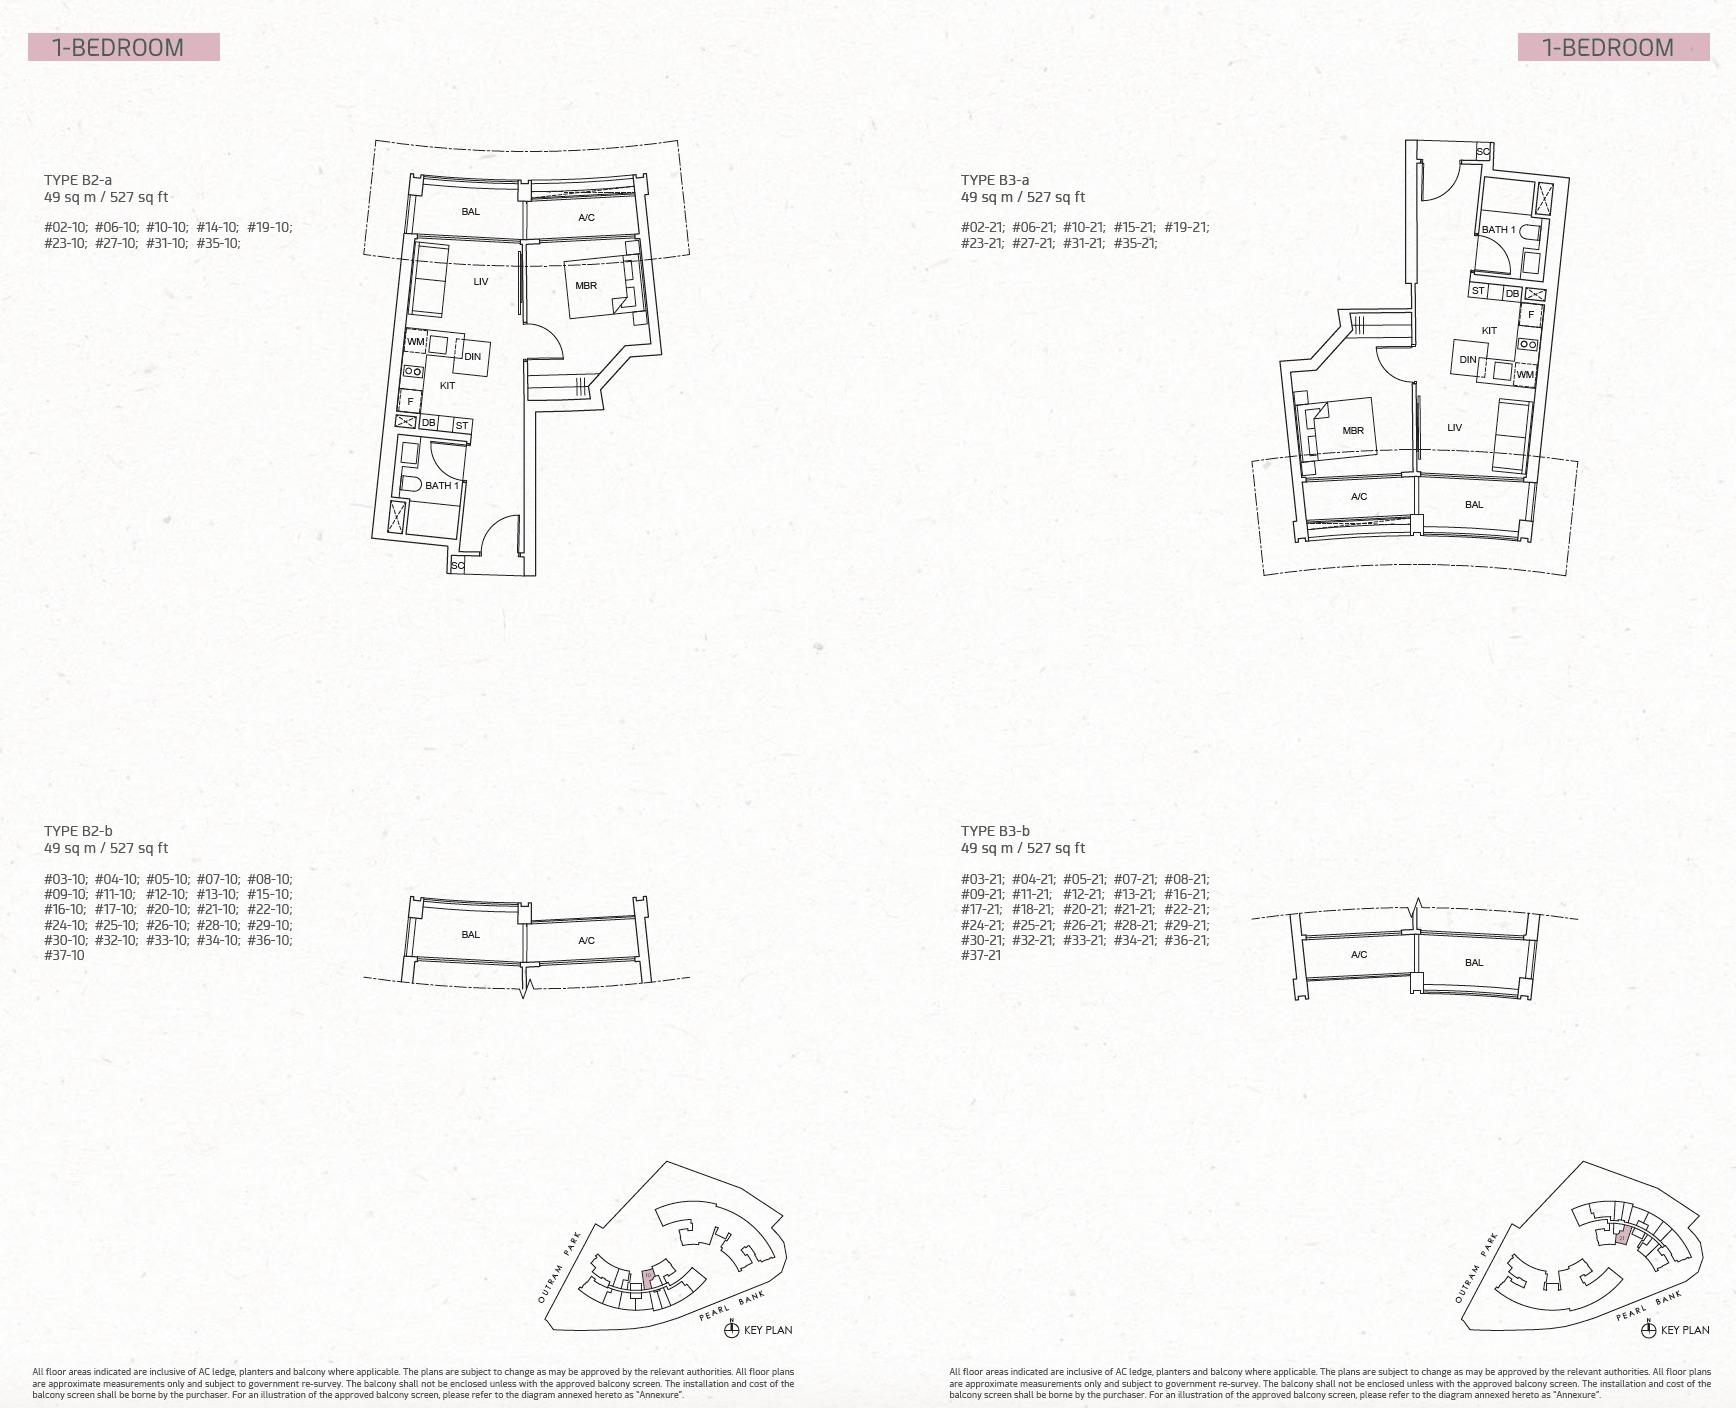 One-Pearl-Bank-floor-plan-1-bedroom